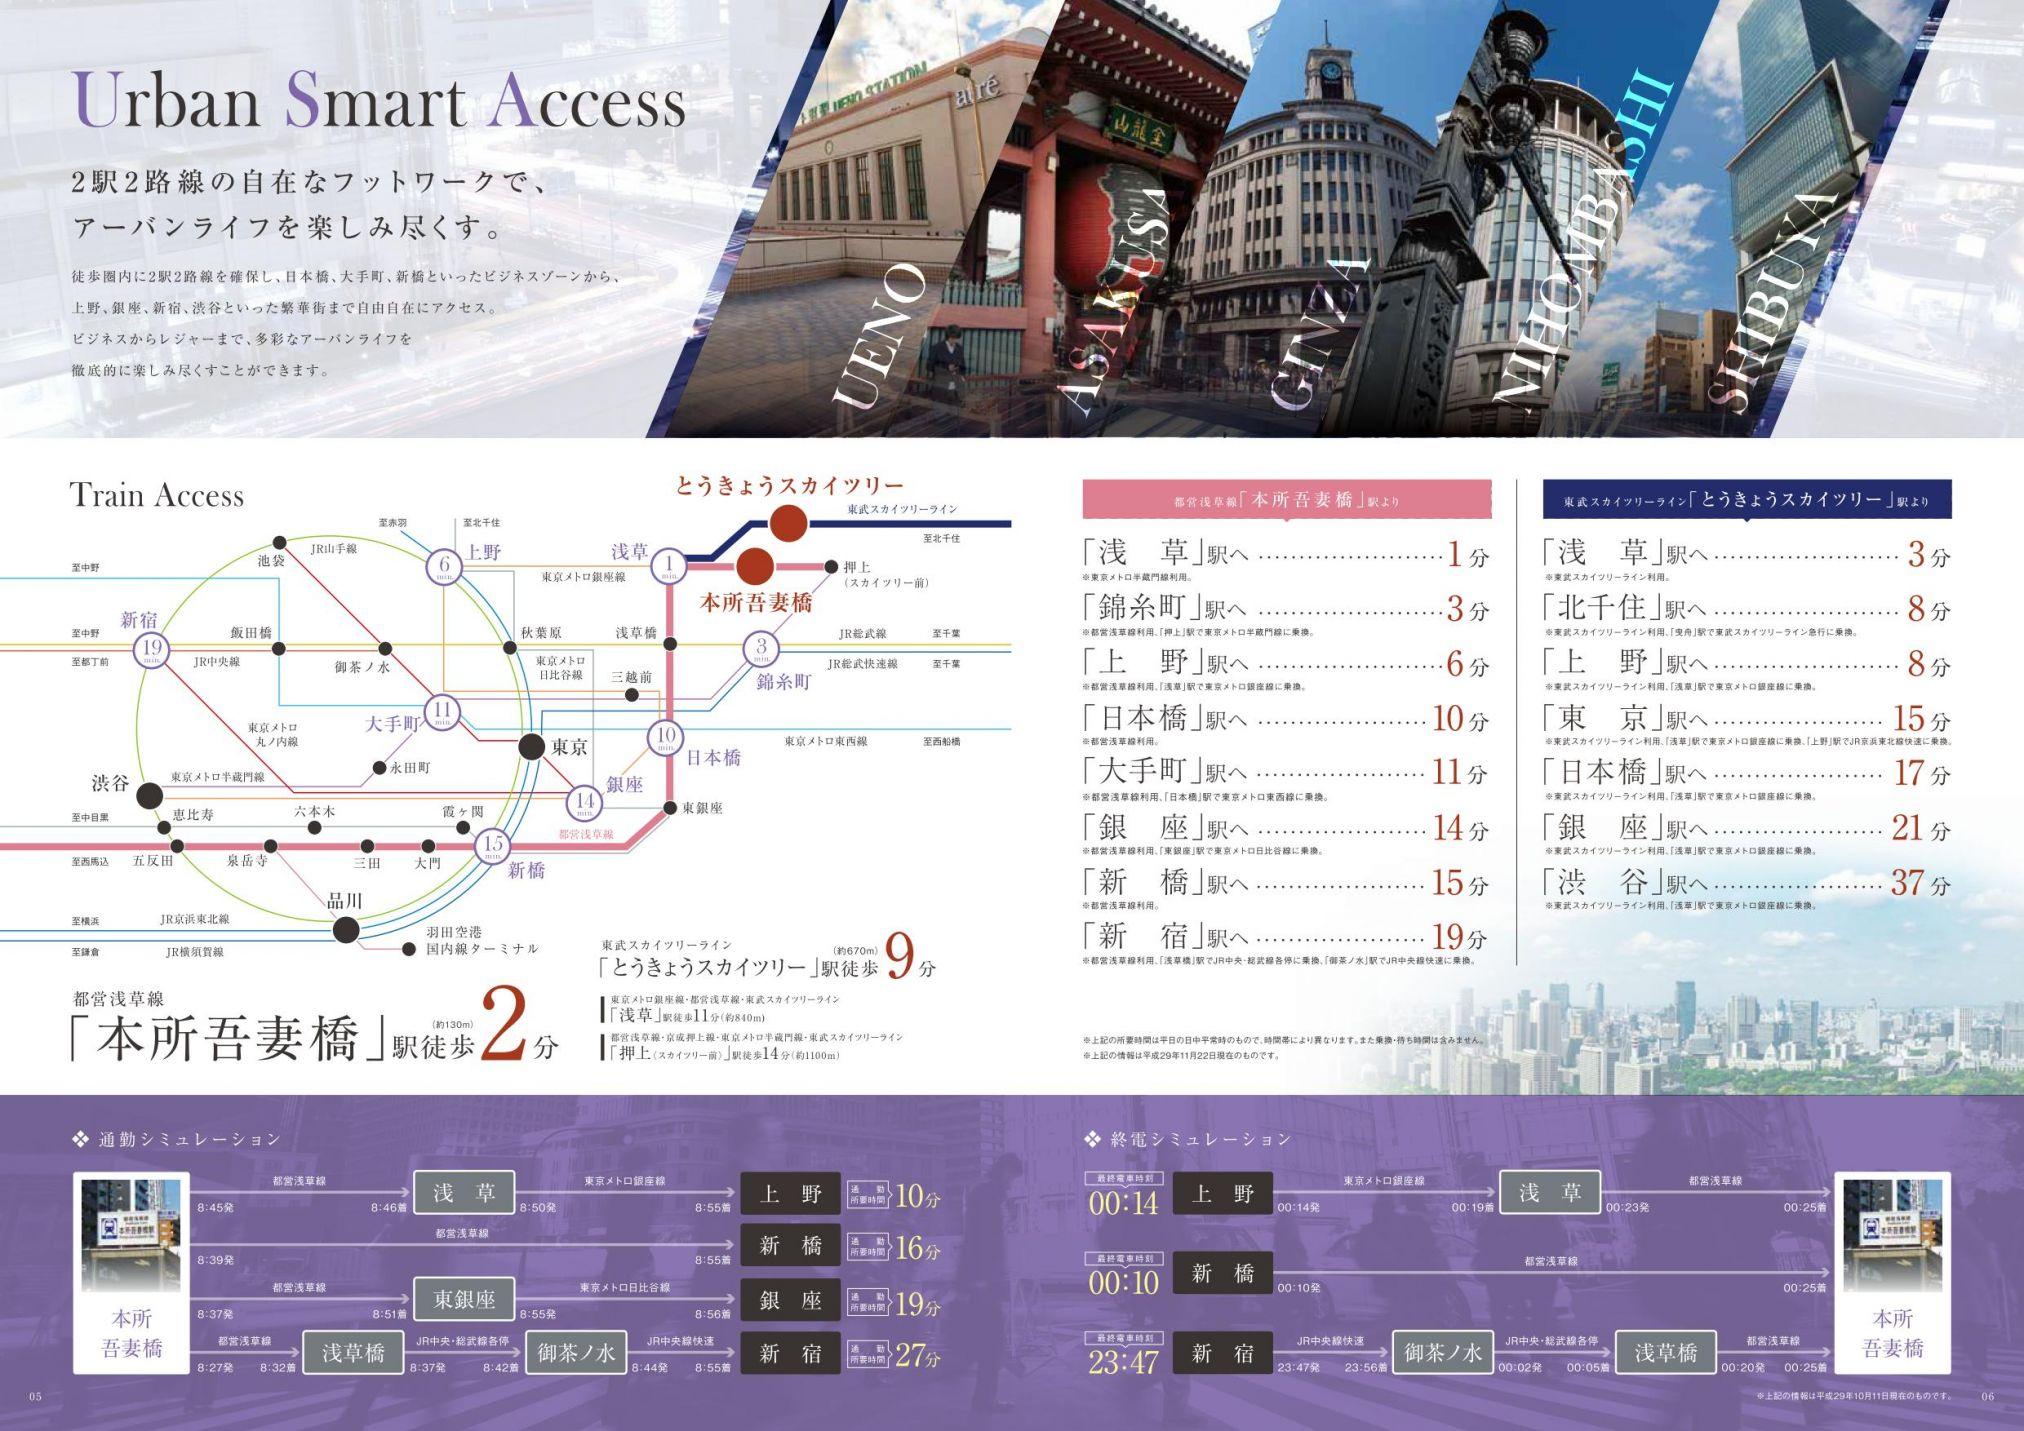 Urban Smart Access